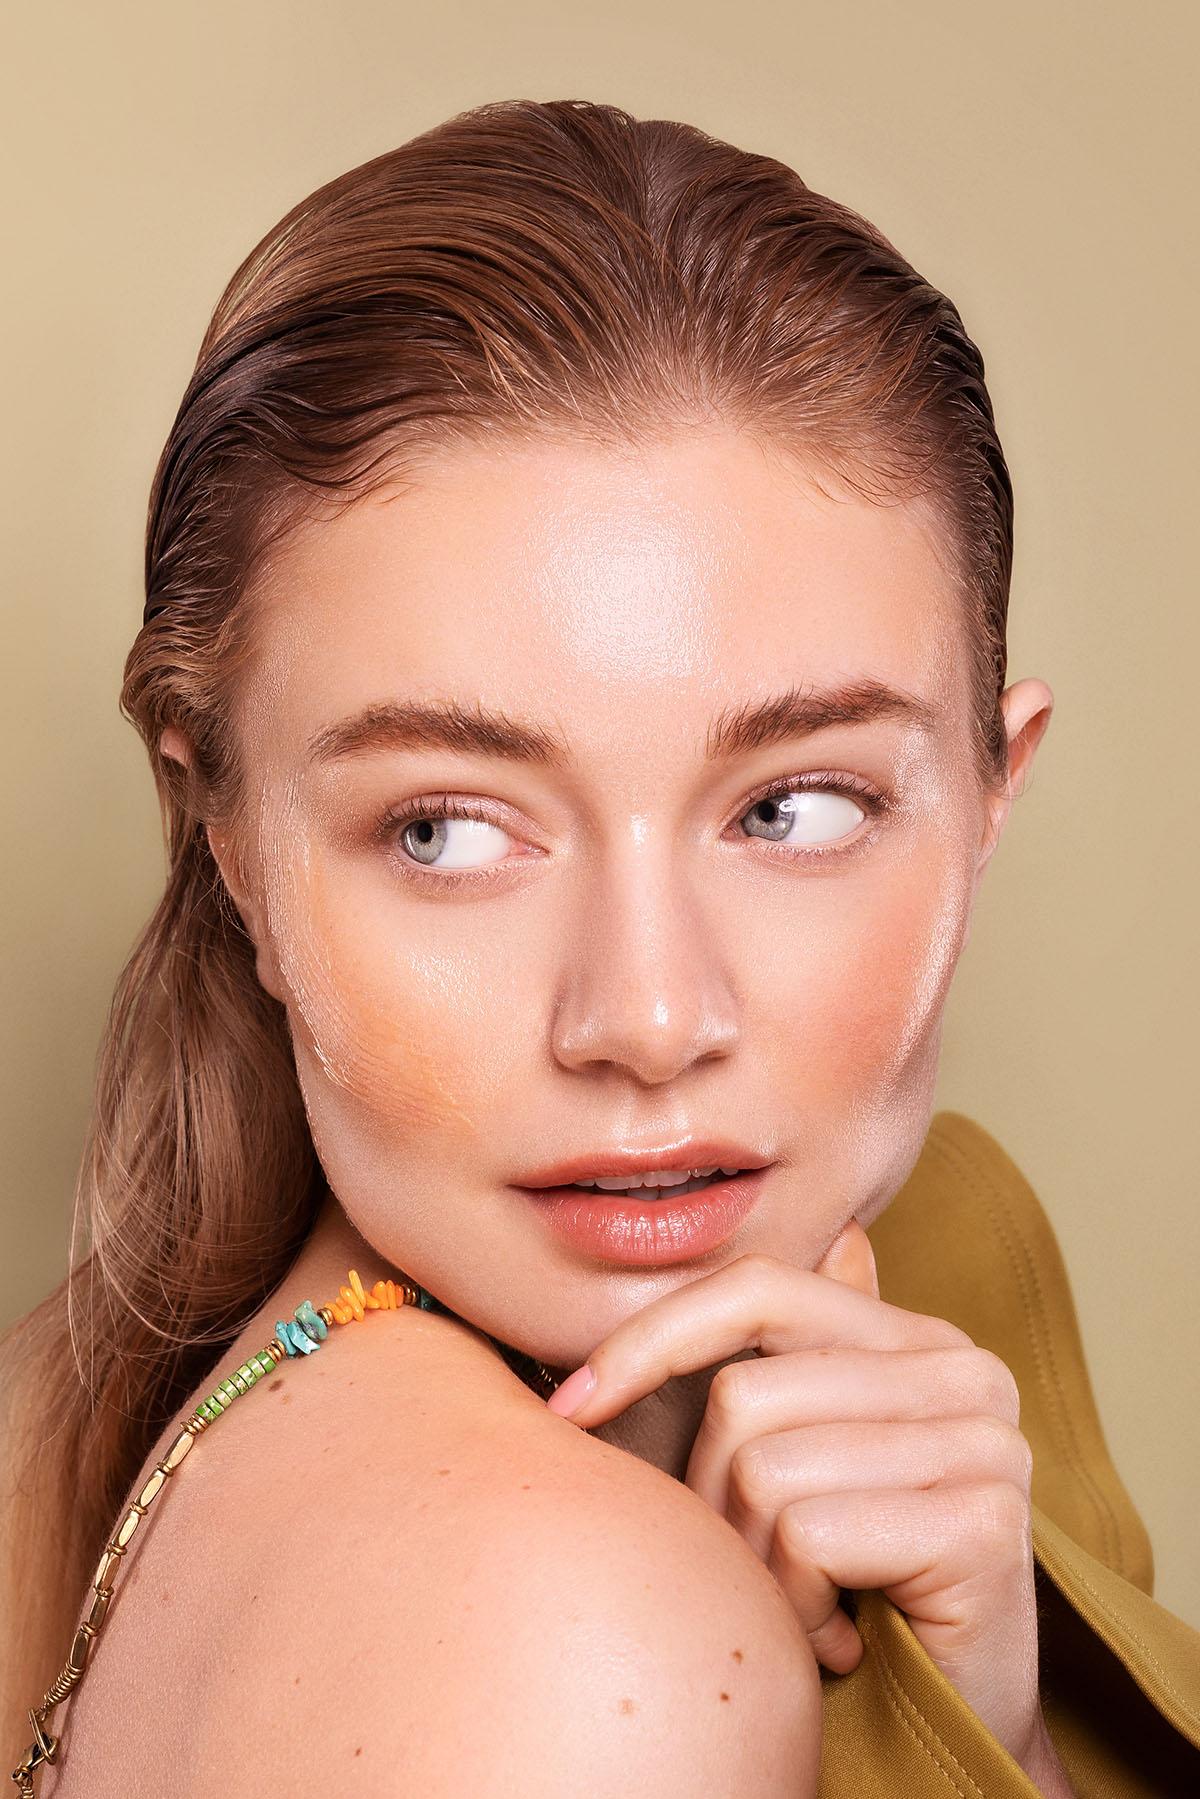 Beauty editorial photoshoot with model Jazzlyn Koene Fresh 'n Fruit for iMirage Magazine by Loesje Kessels